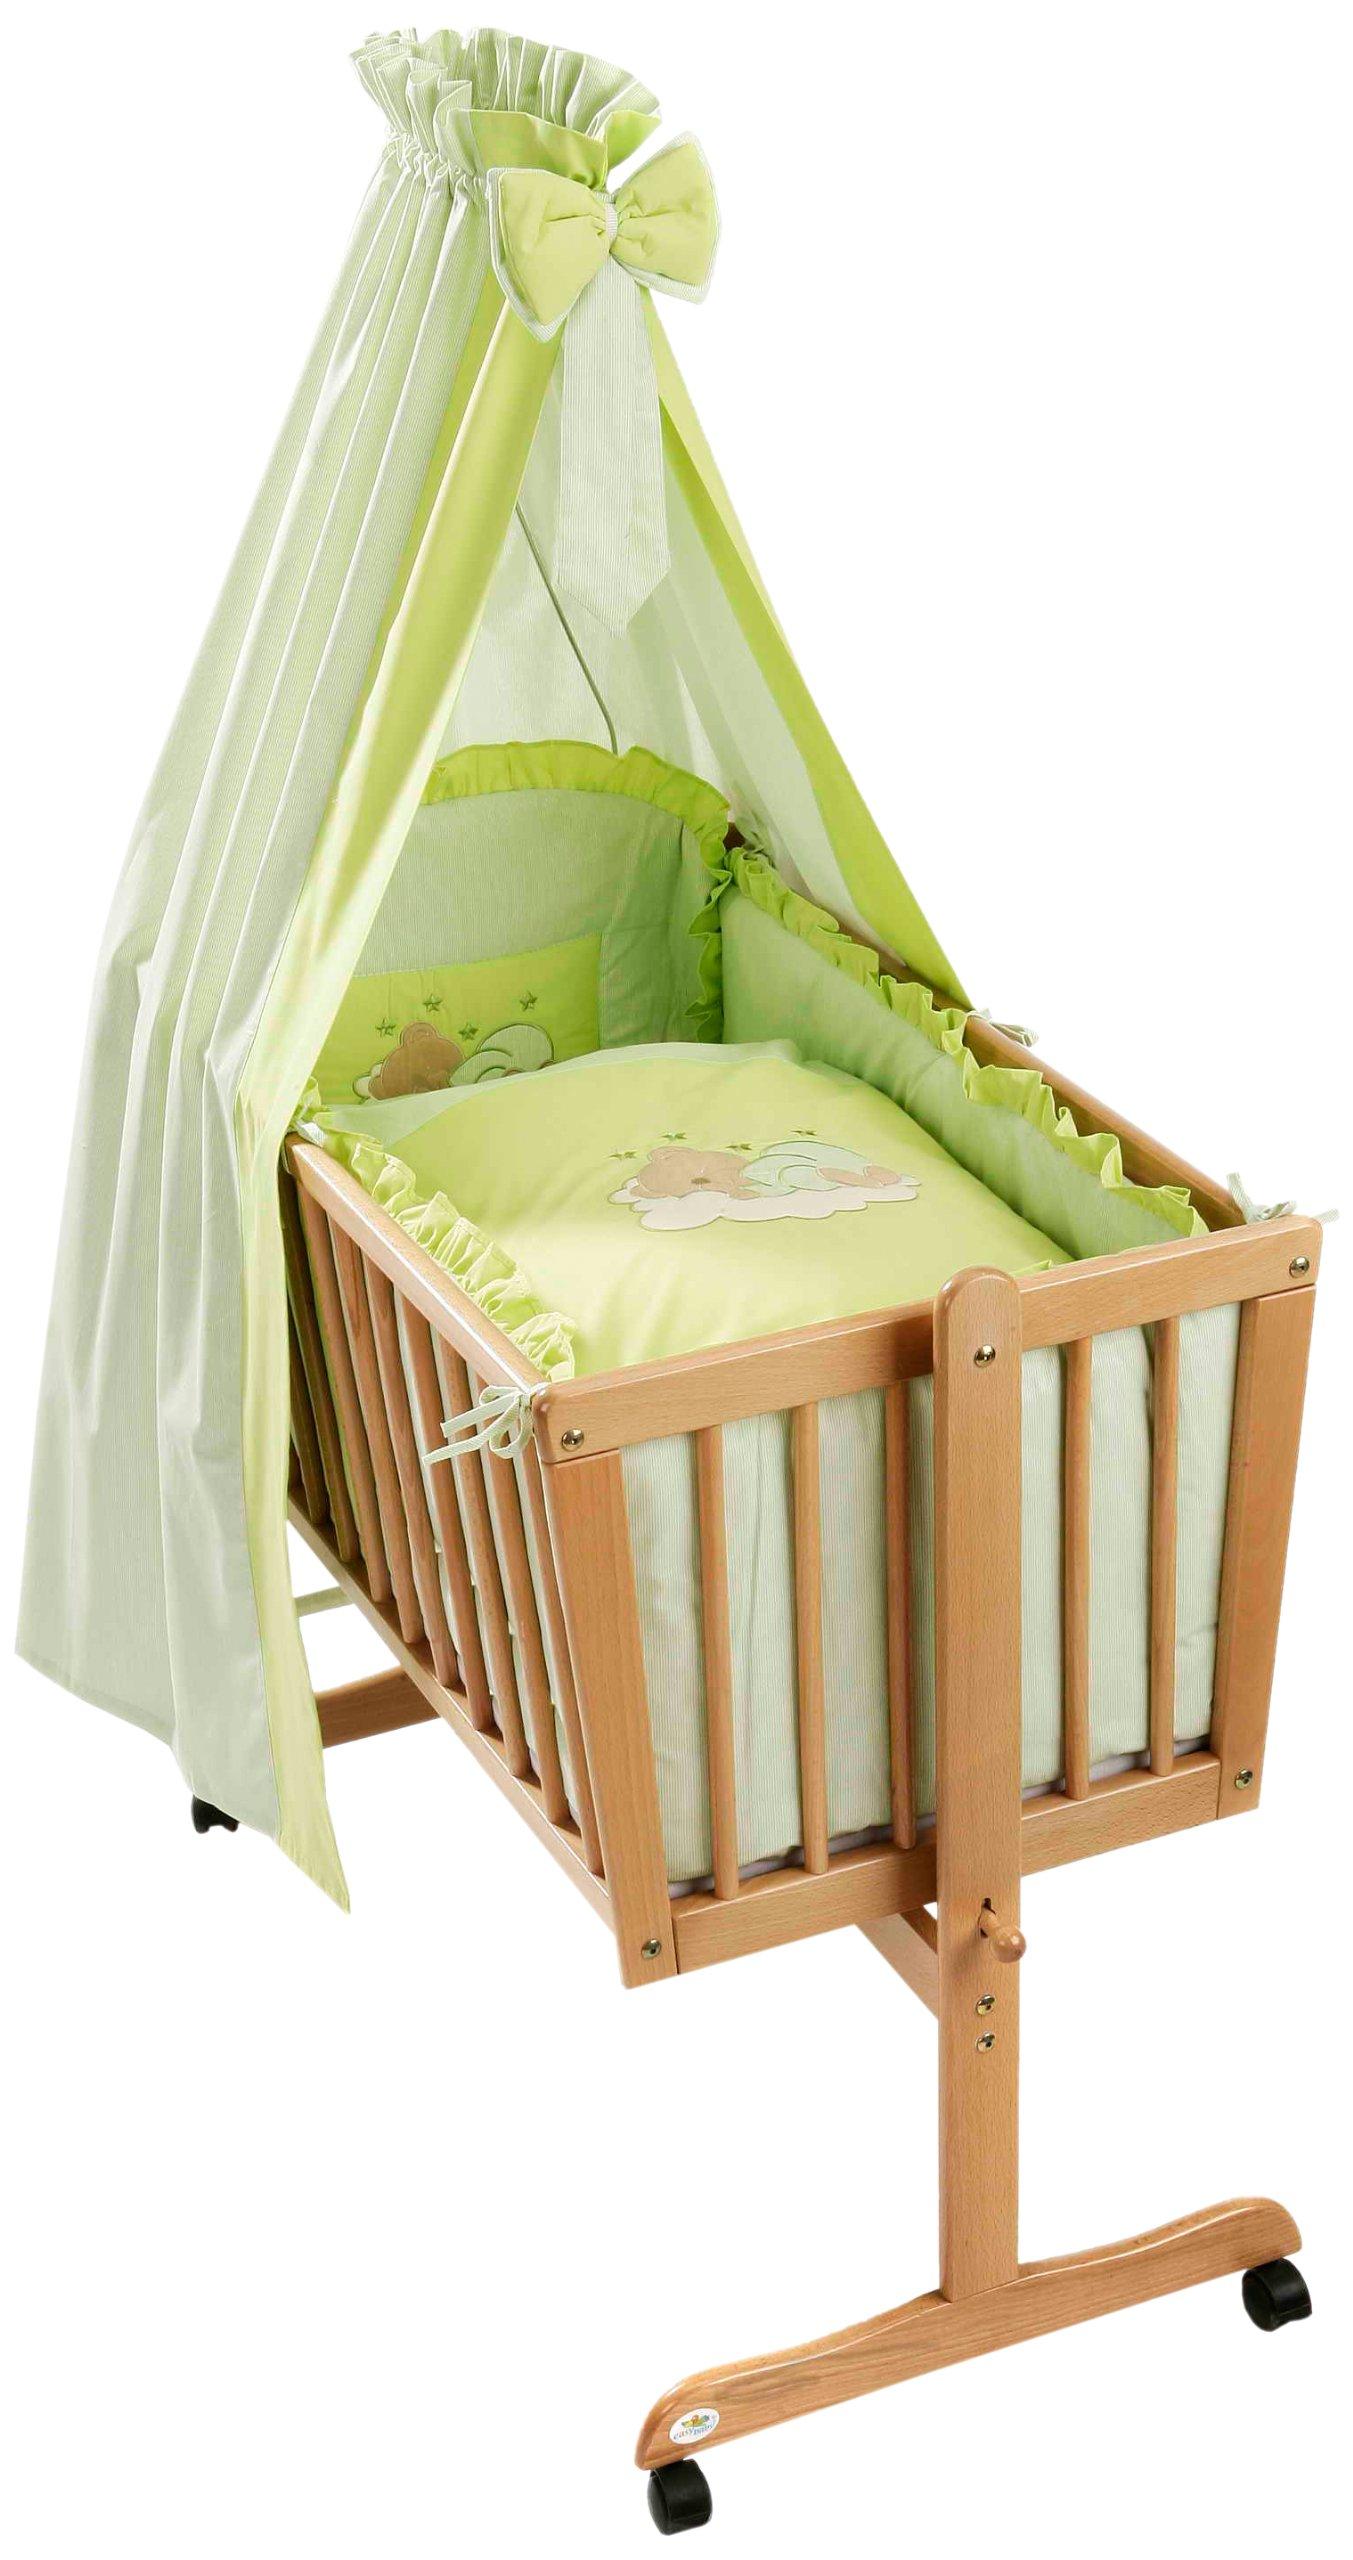 Easy Baby 480-84 Wiegenset Sleeping Bear grün product image